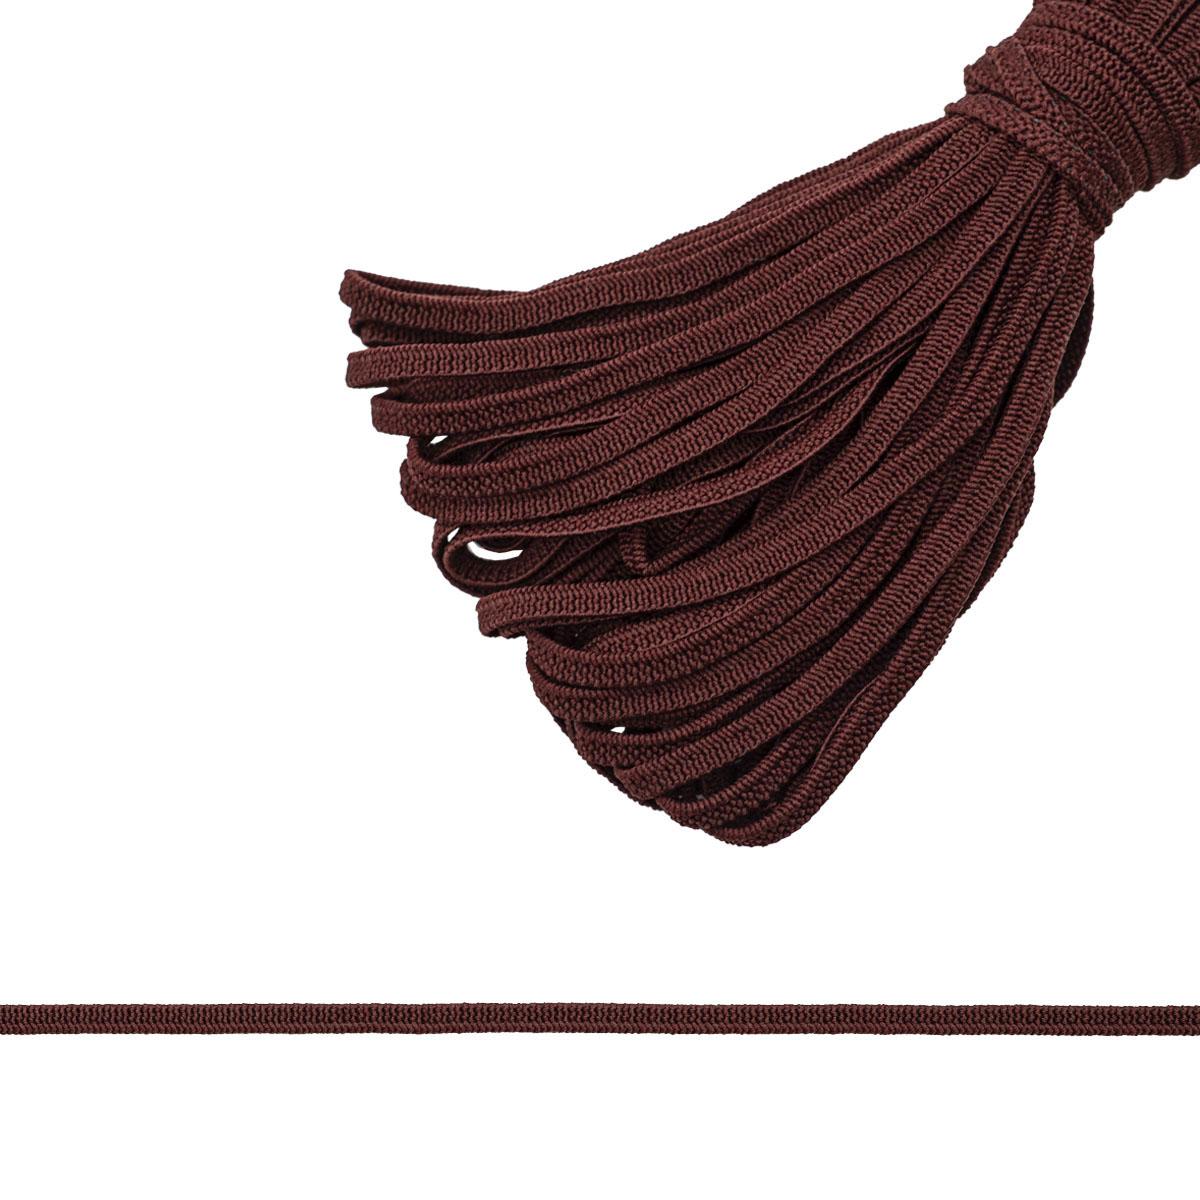 С3847Г17 Резинка мягкая масочная рис.9597 4мм*10м